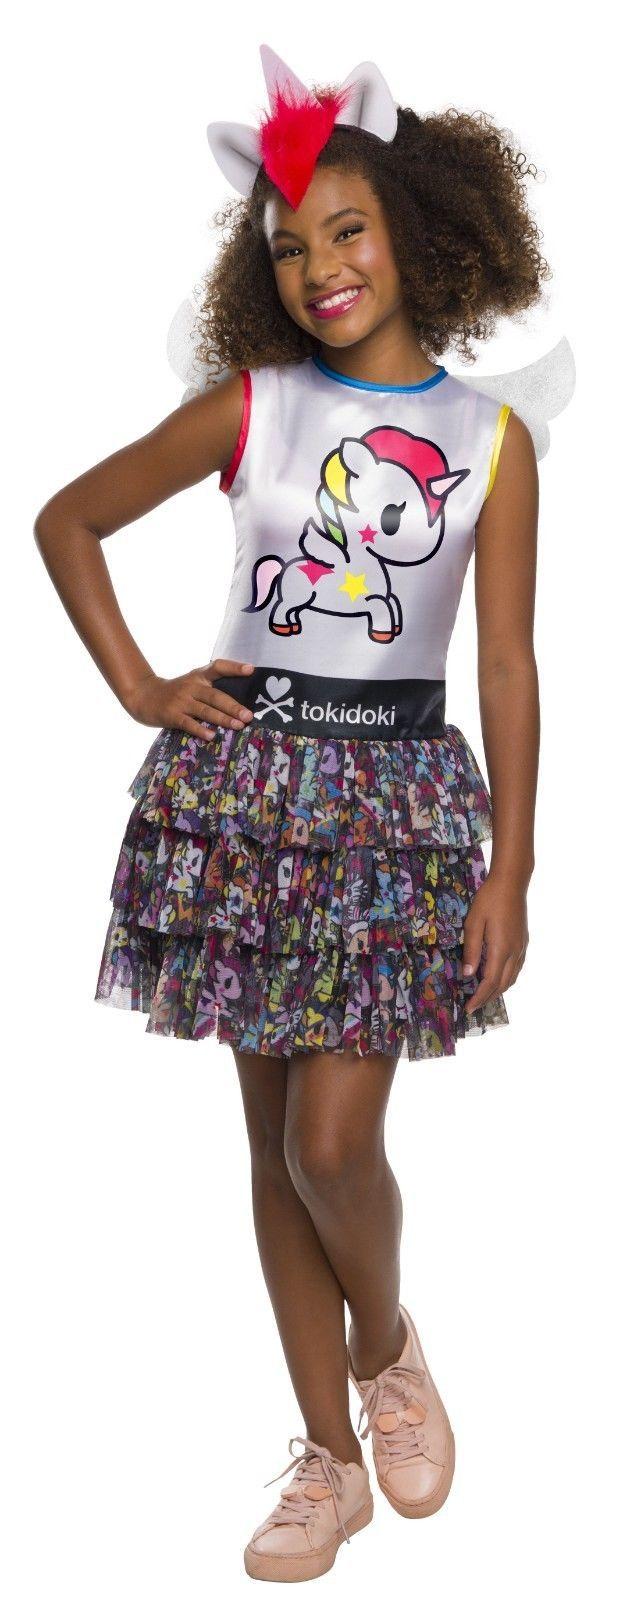 Rubies Tokidoki Stellina Einhorn Kleid Kawaii Kinder Halloween Kostüm 641186